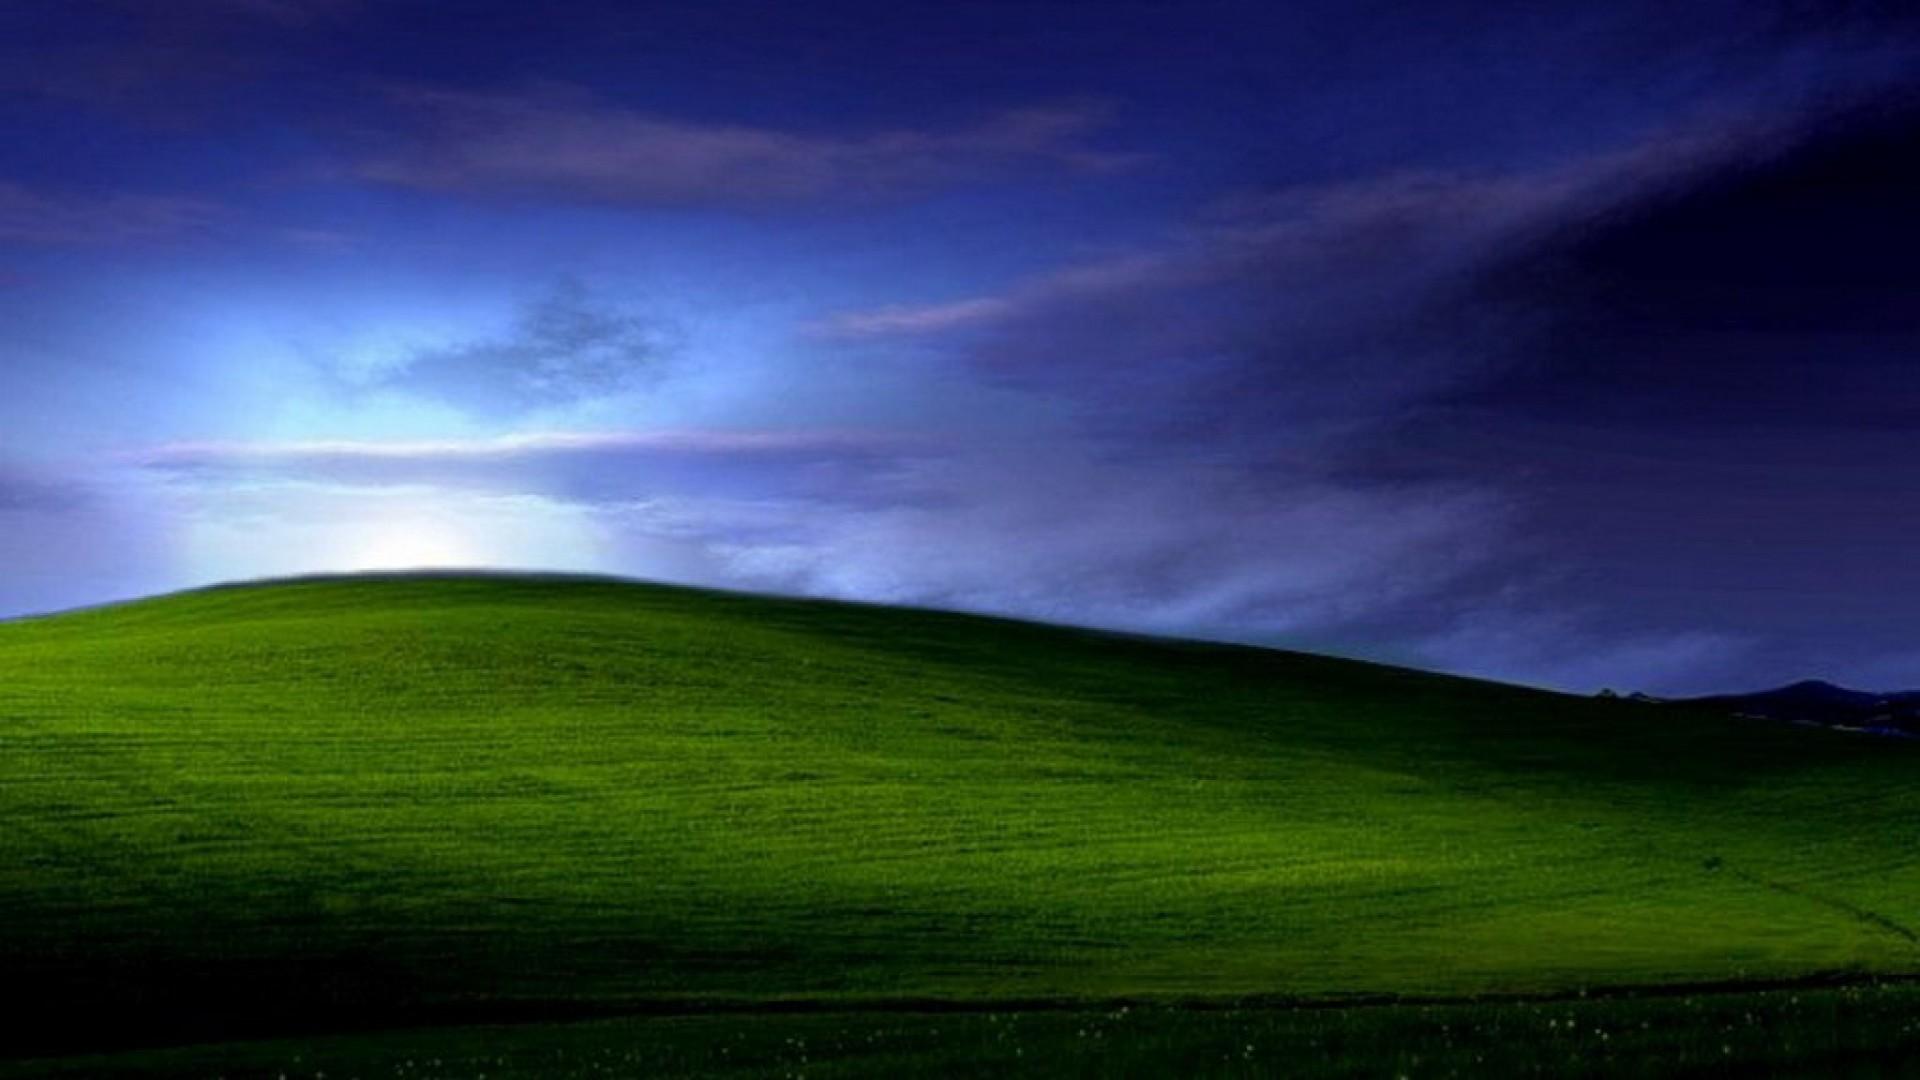 Windows Xp Wallpaper 46 Pictures